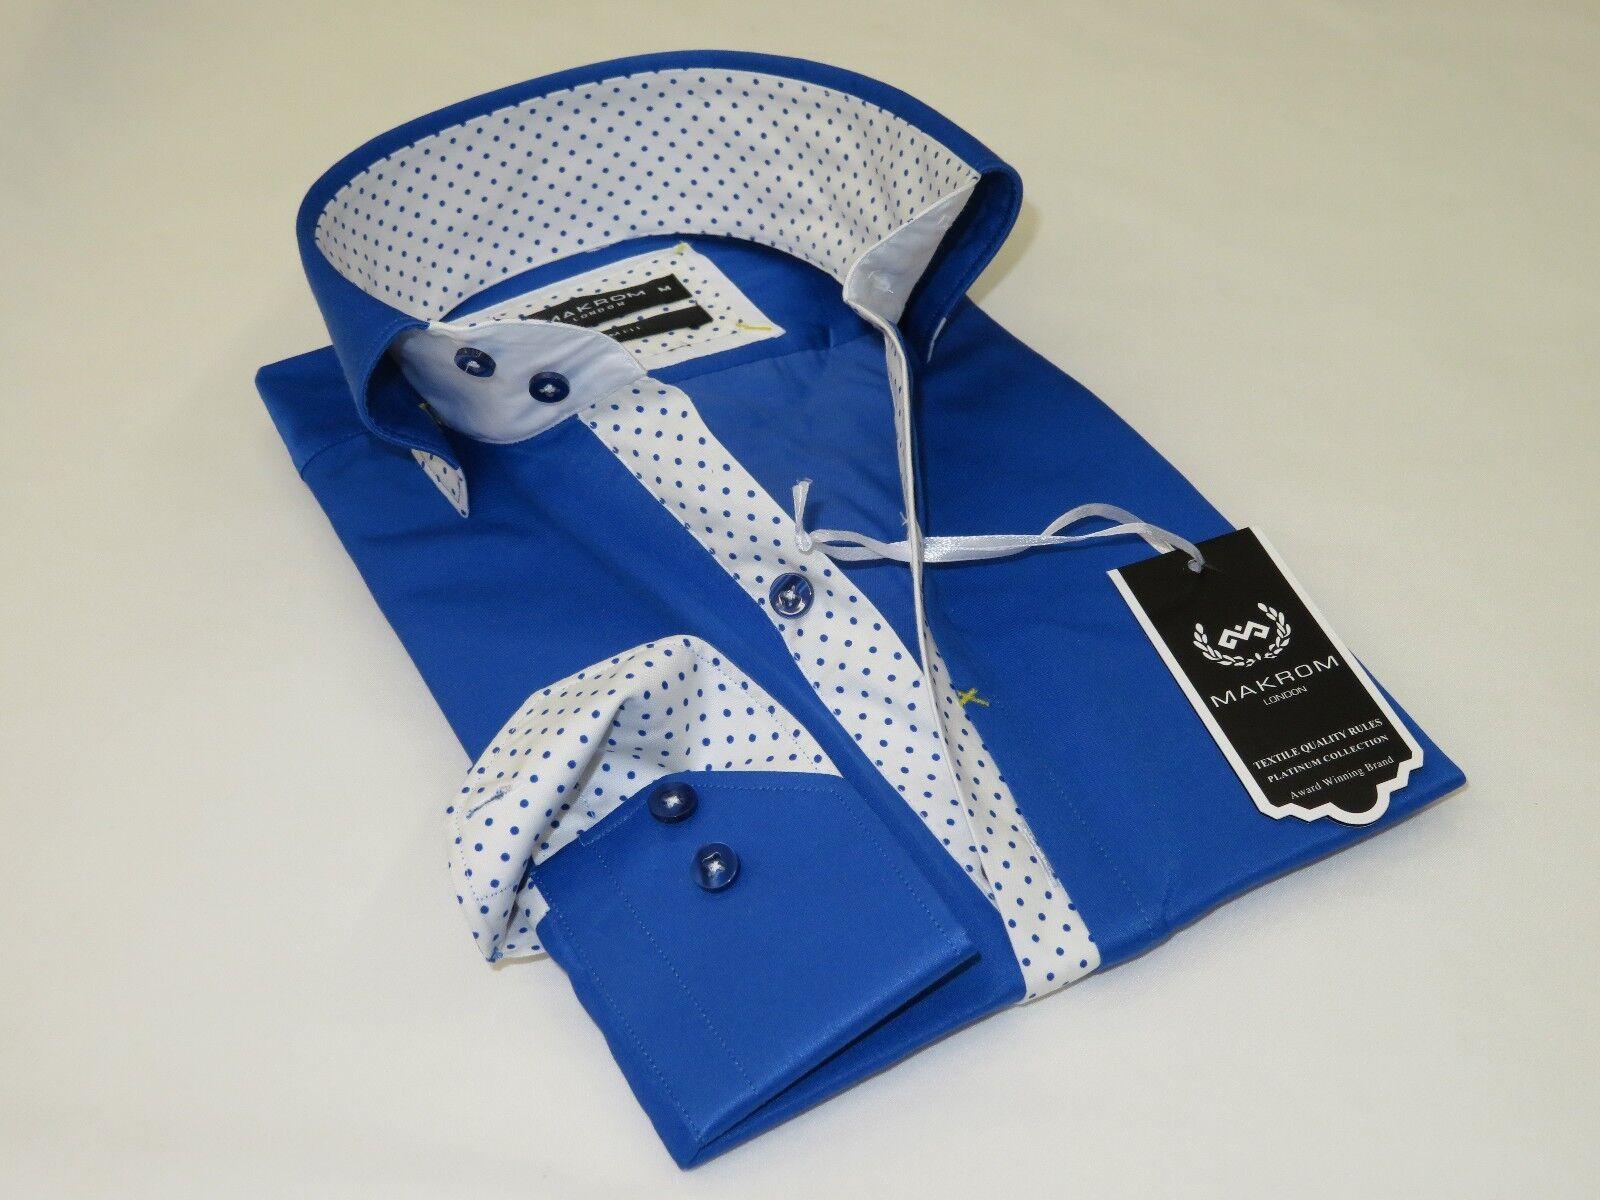 Uomo Uomo Uomo Makrom London Camicia Misto Cotone Pieghe Less 6263-780 Blu Reale a Pois 9b7fe7